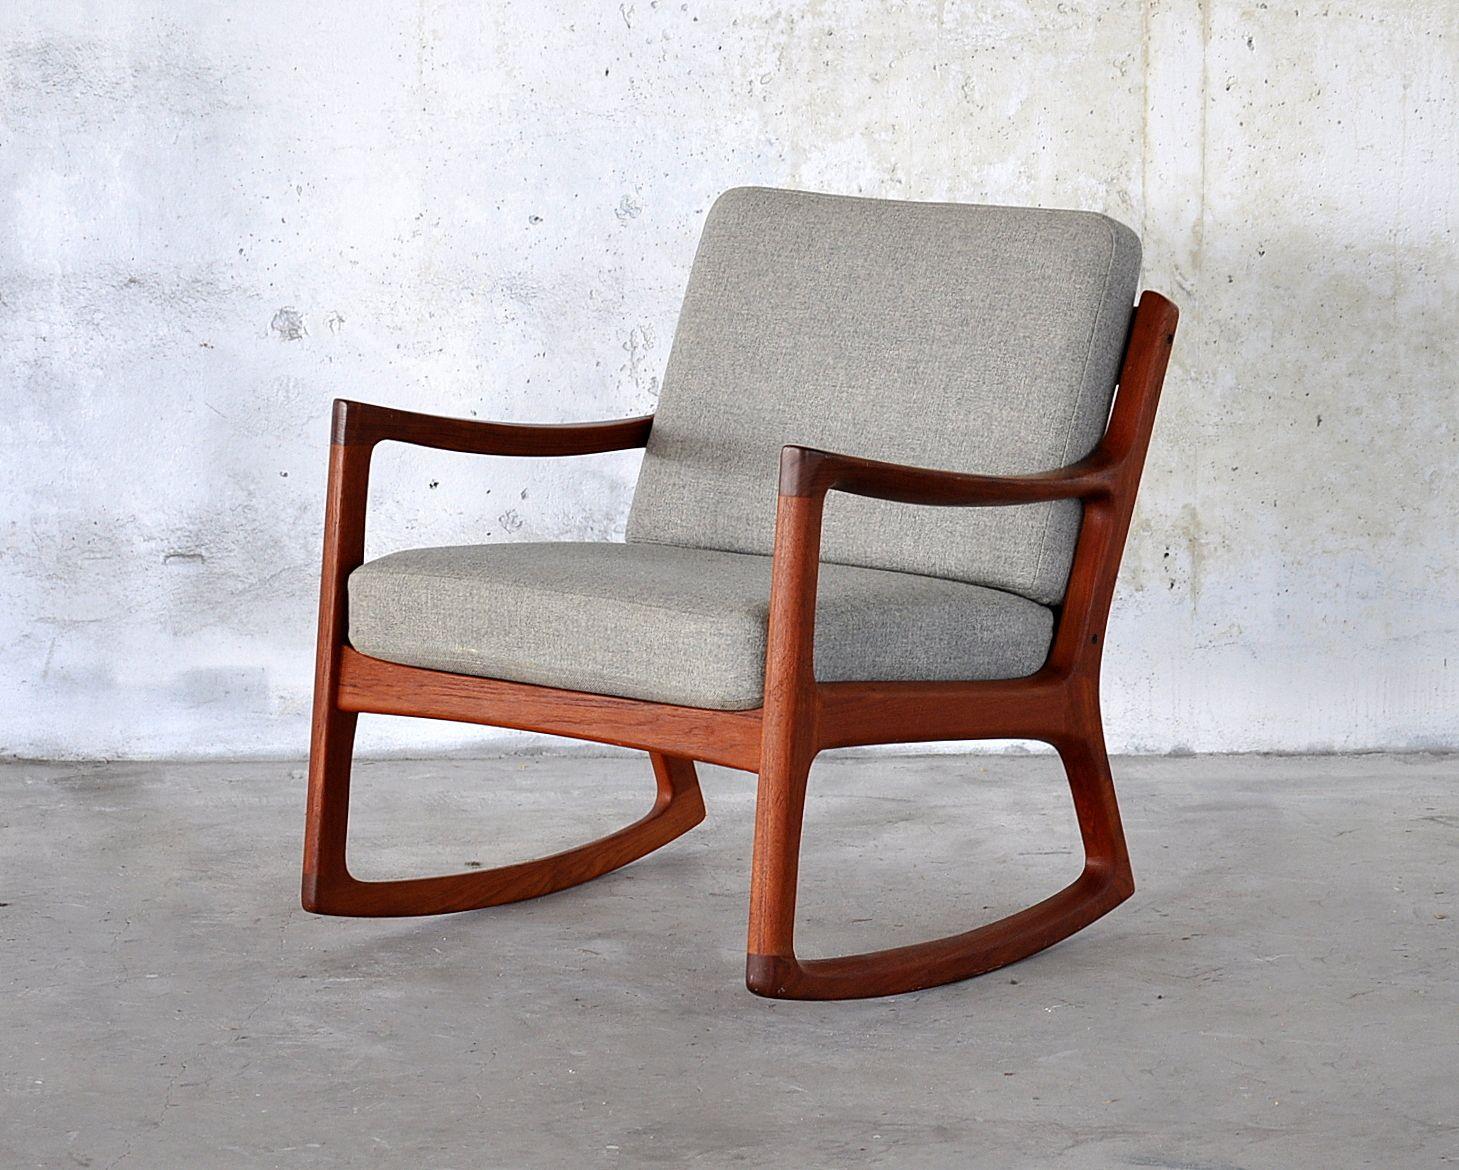 Pin by Ranja Sem on Bloomington condo Teak rocking chair